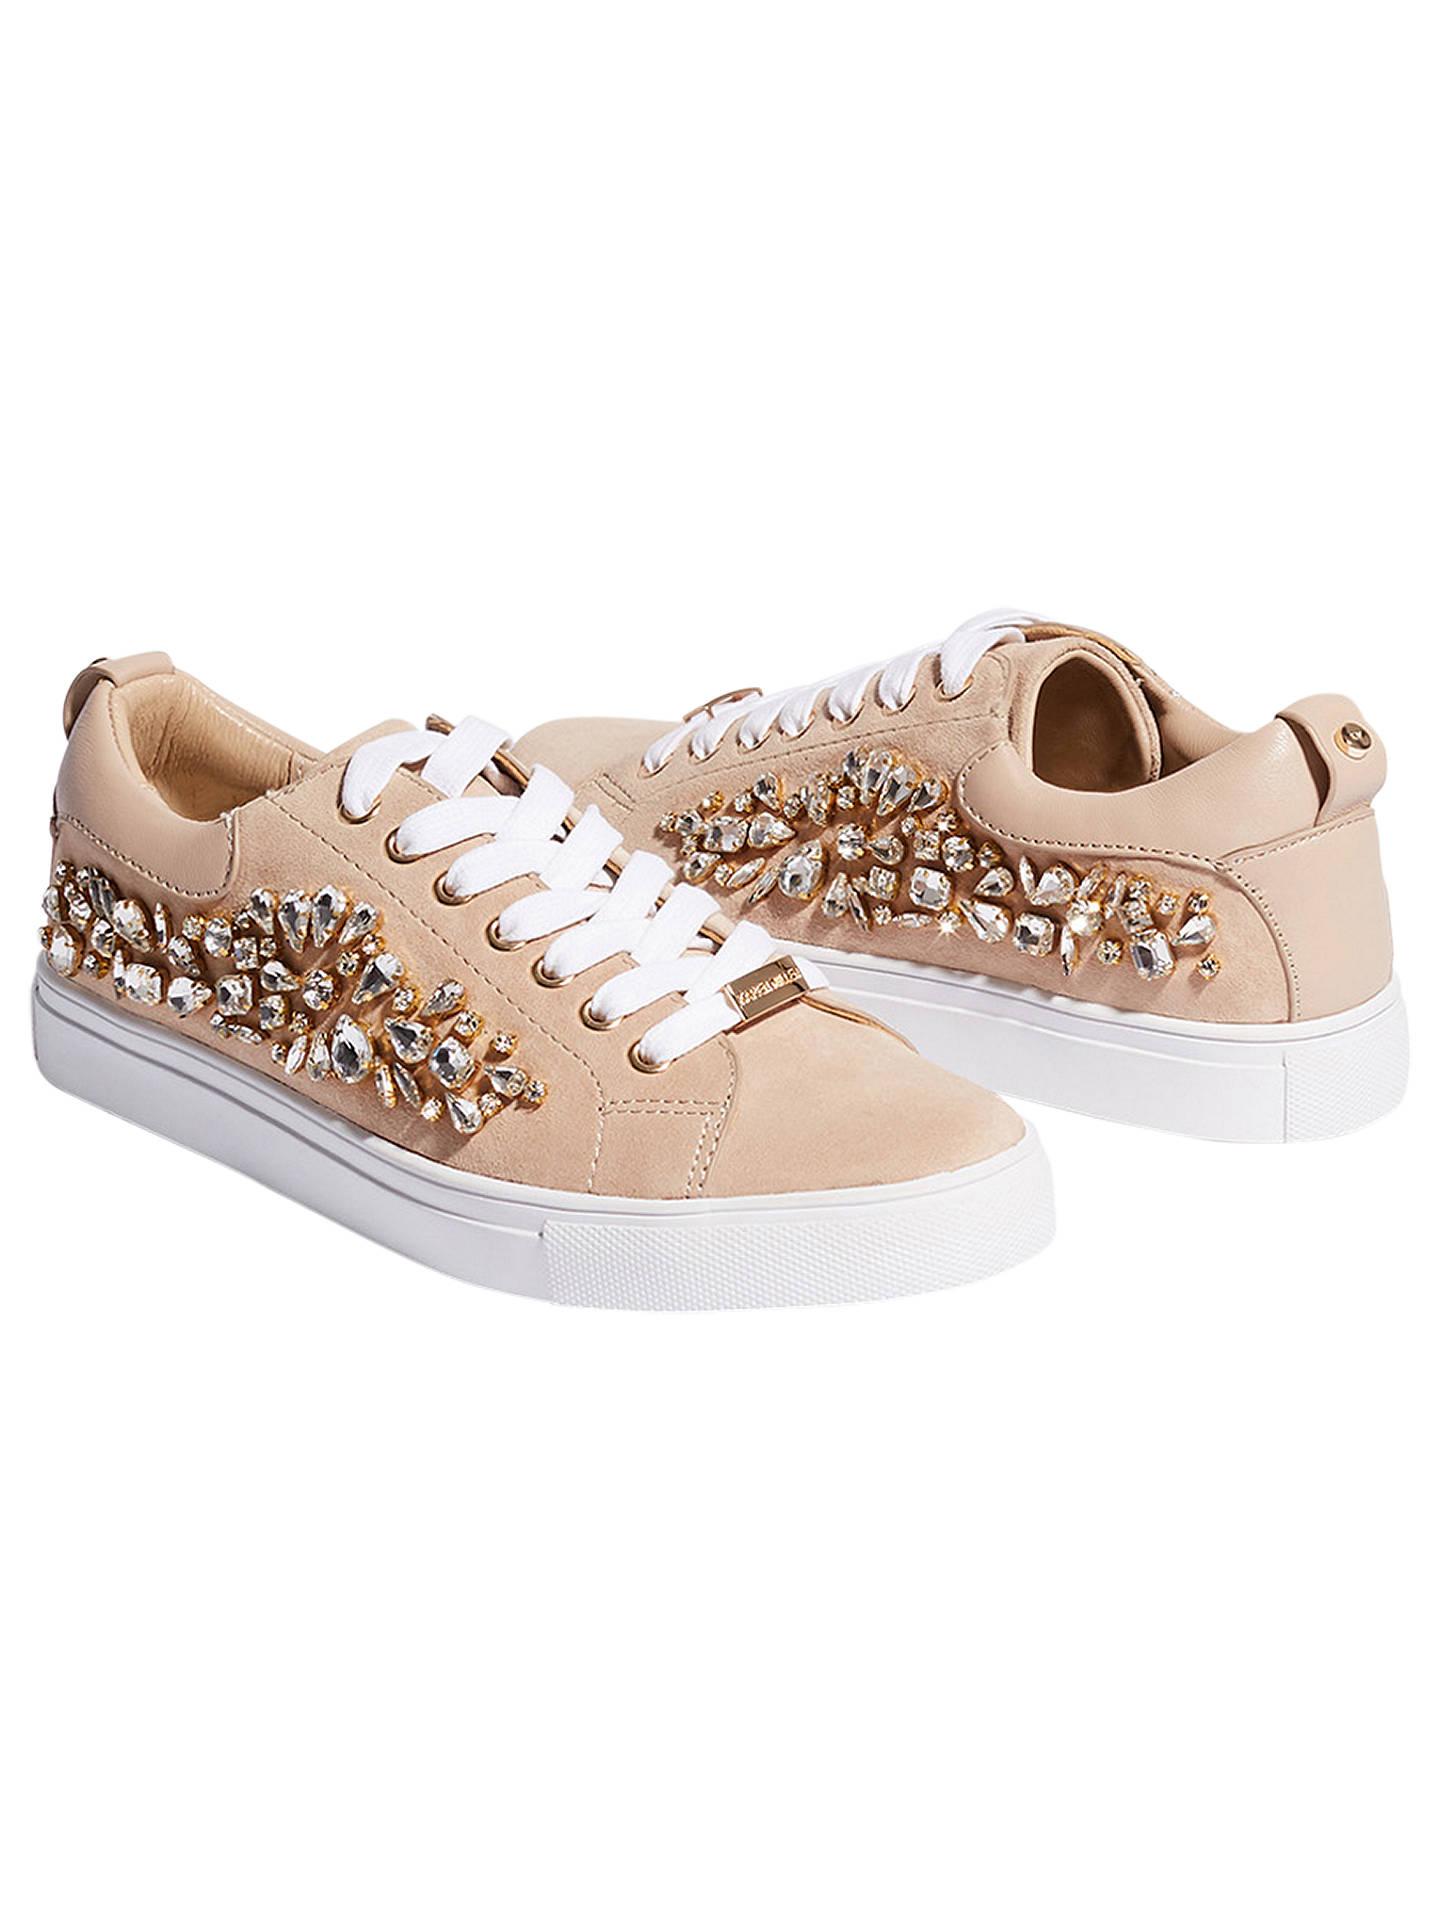 5480b43b76a1b0 ... Buy Karen Millen Jewel Embellished Lace Up Trainers